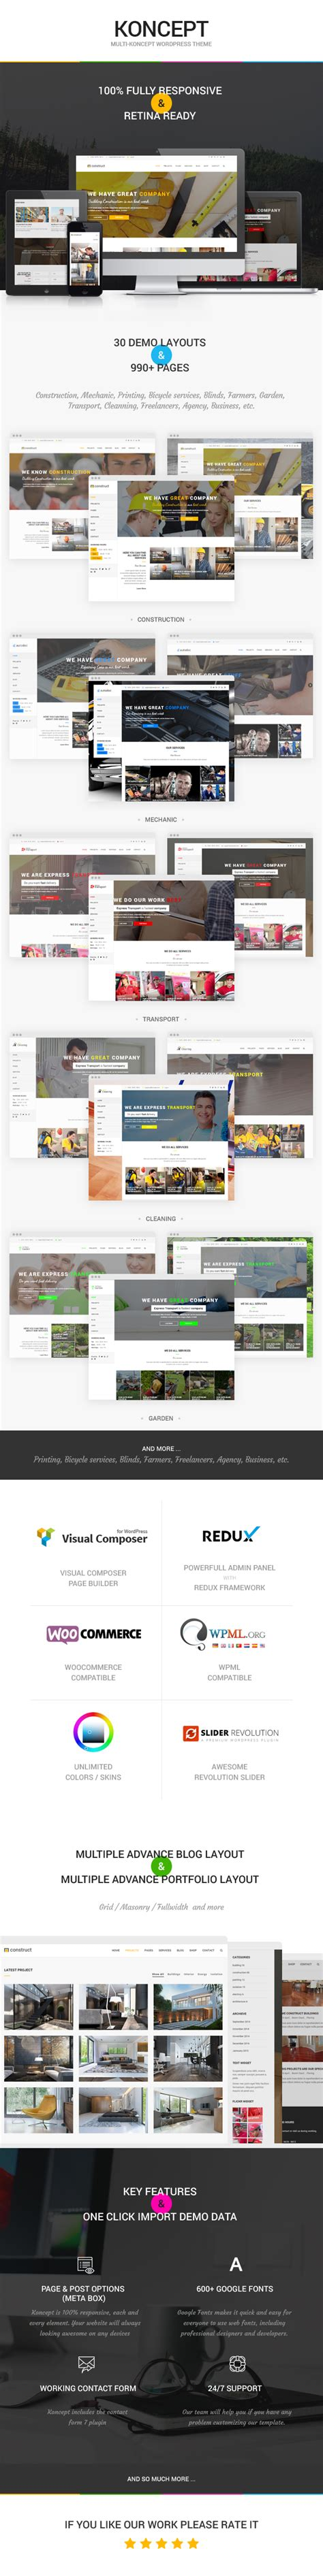 themeforest koncept koncept responsive multi concept wordpress theme